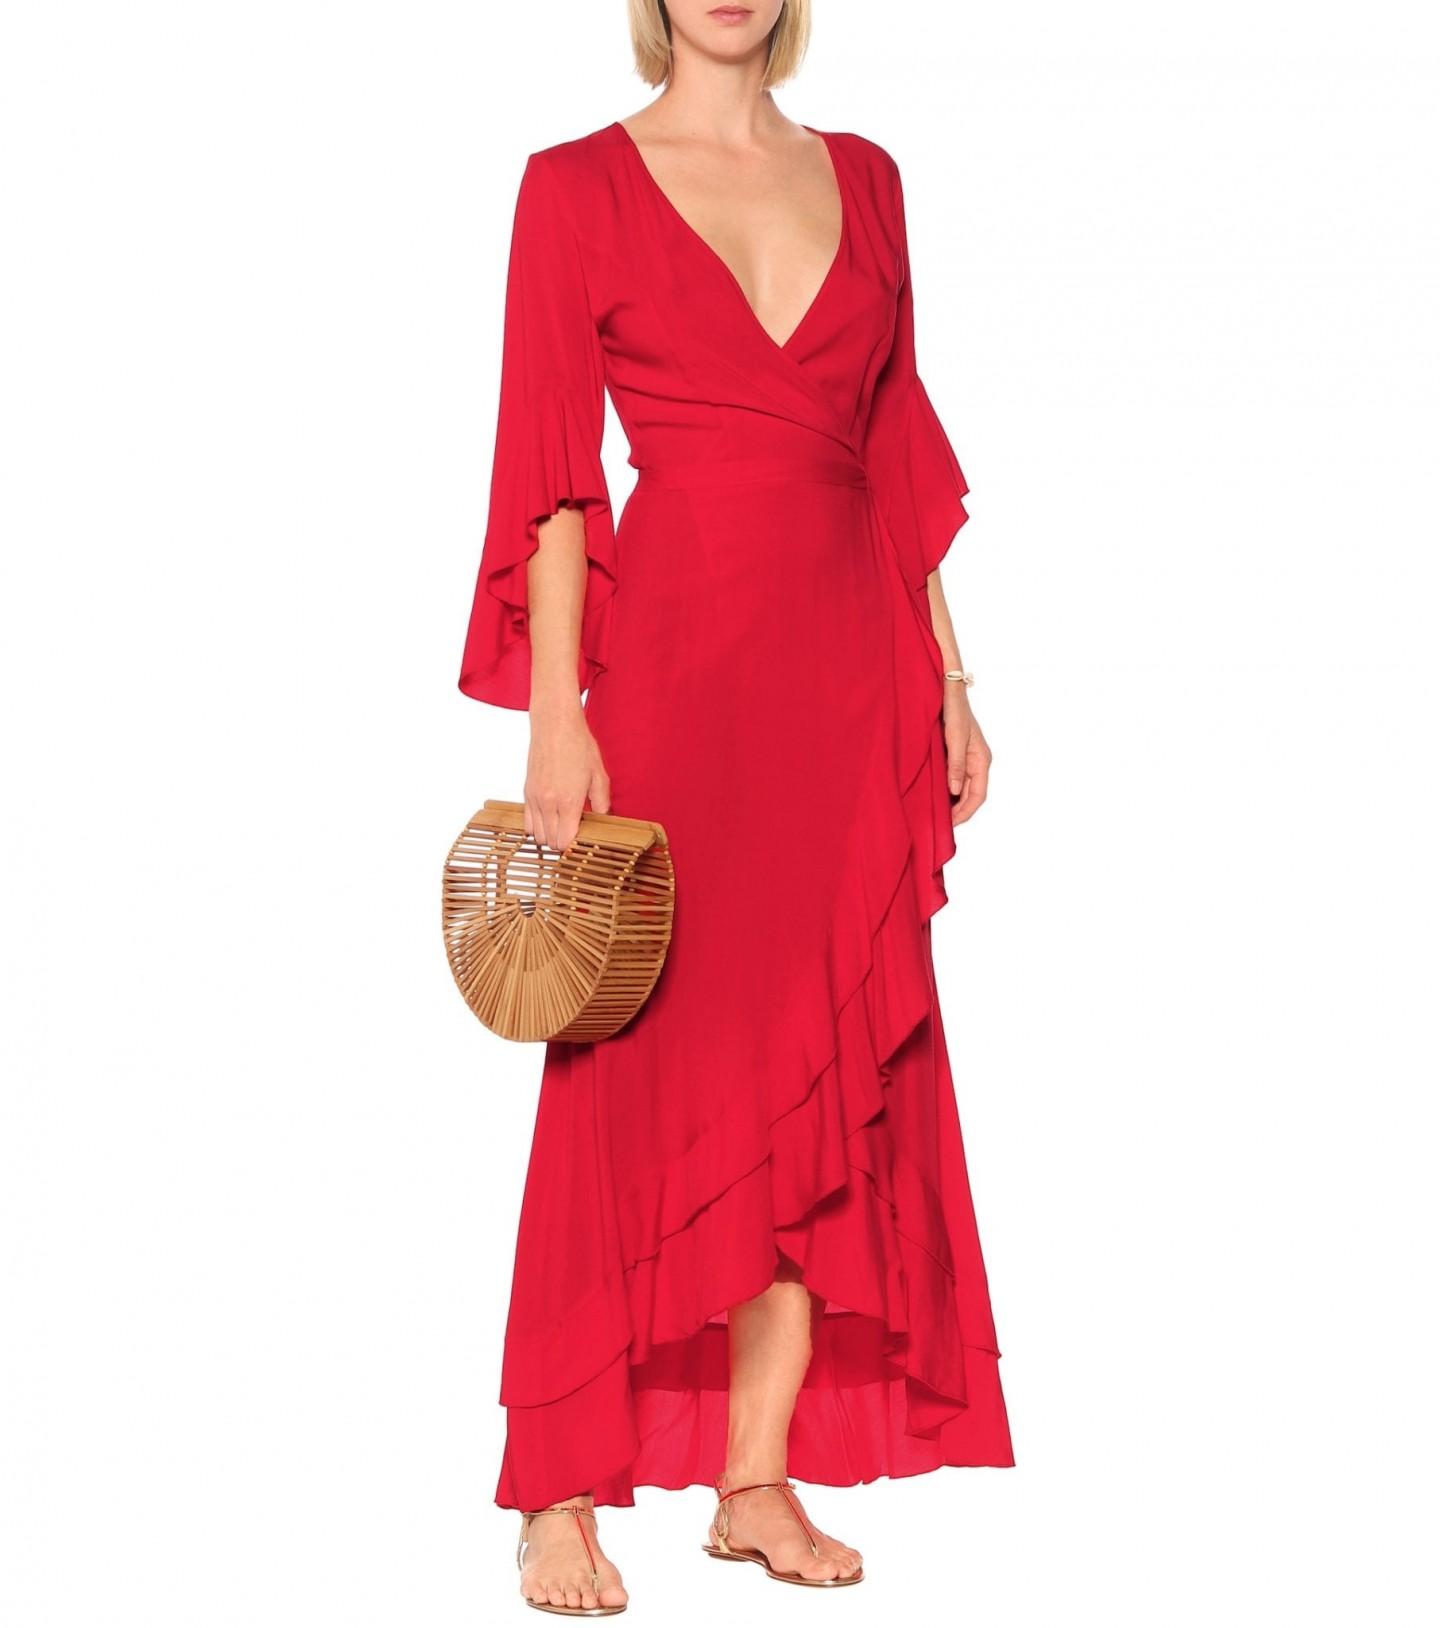 MELISSA ODABASH Cheryl Ruffle Wrap Maxi Dress